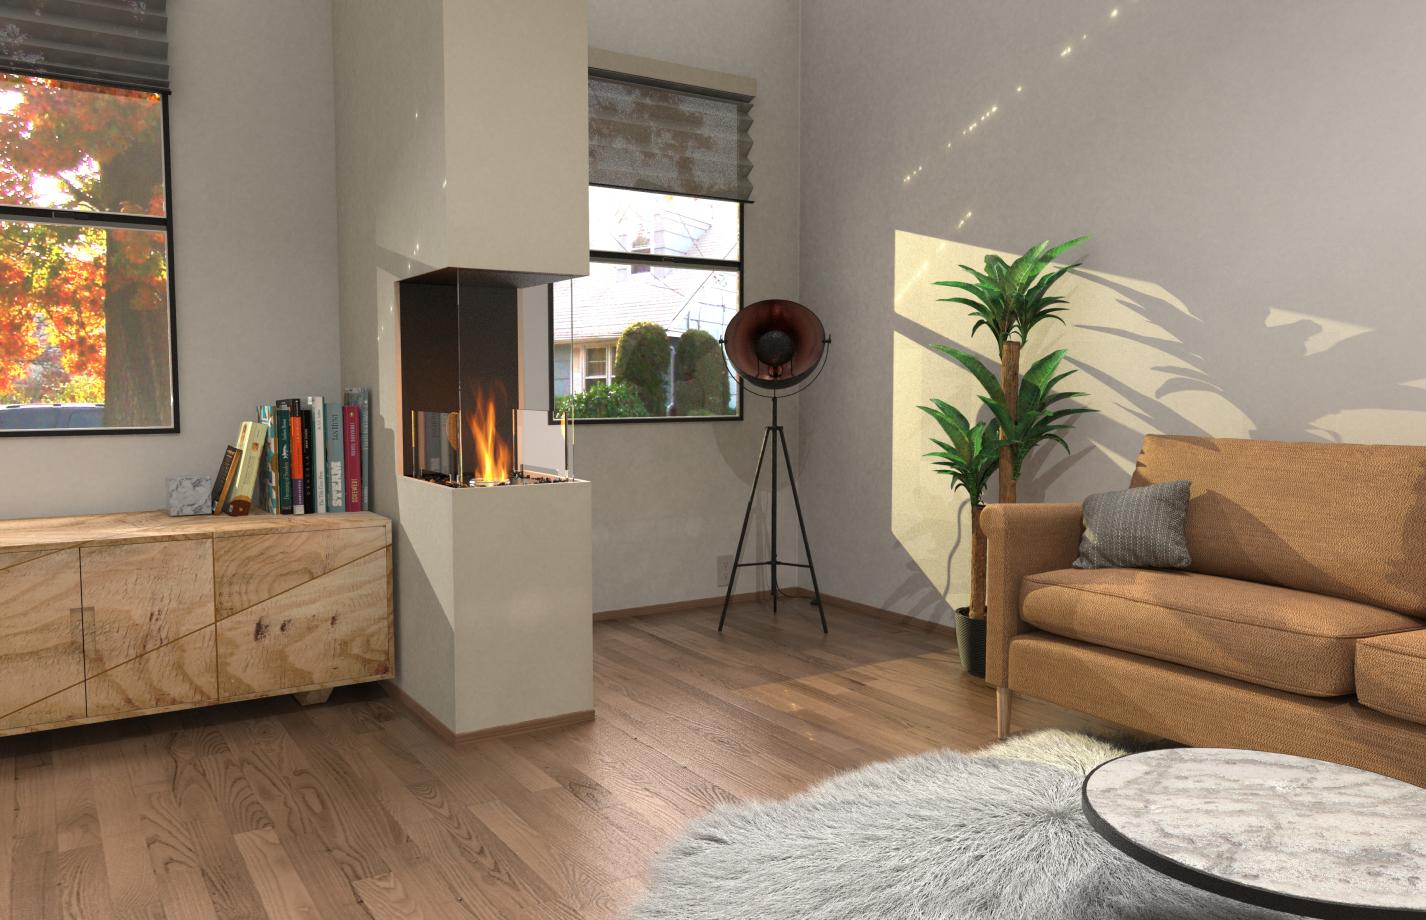 Flex 18PN Peninsula Fireplace